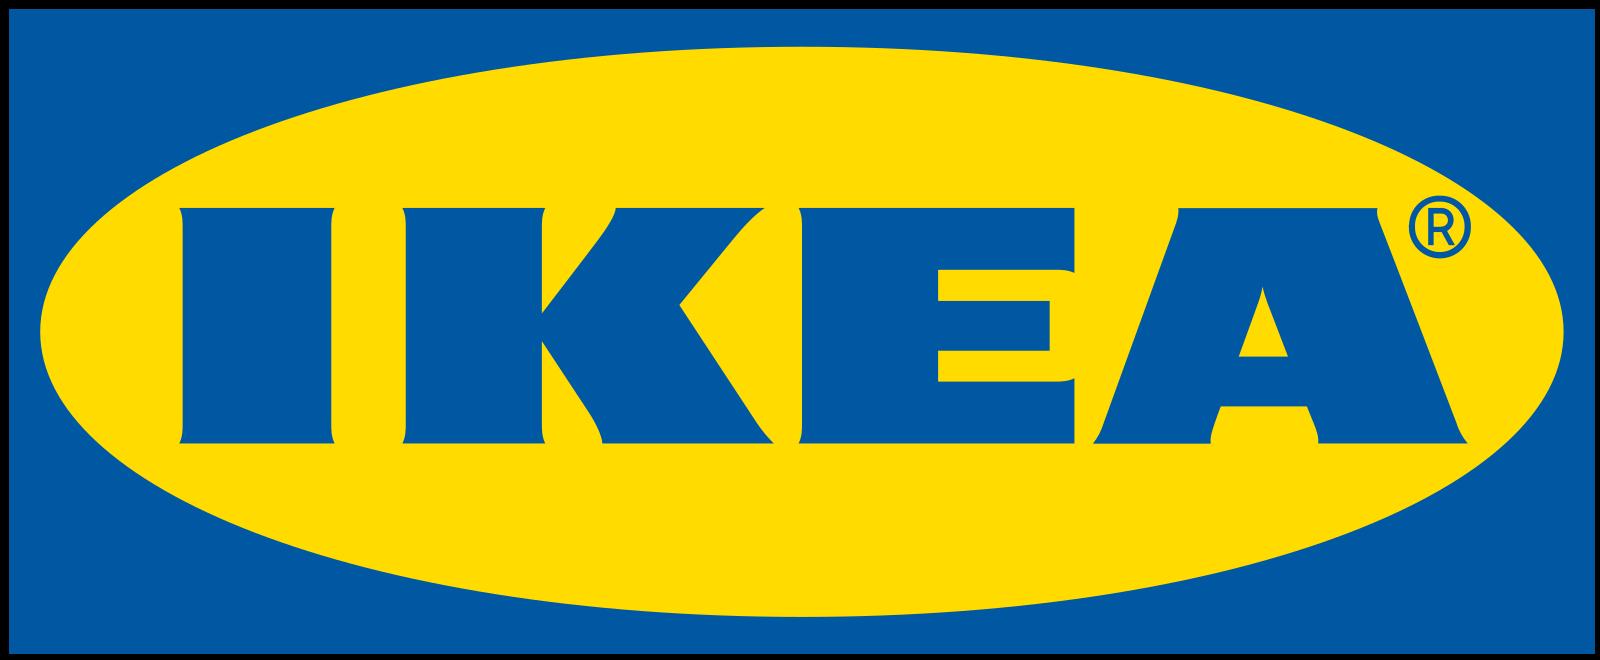 Creator of IKEA, Ingvar Kamprad – Dyslexic Entrepreneurs